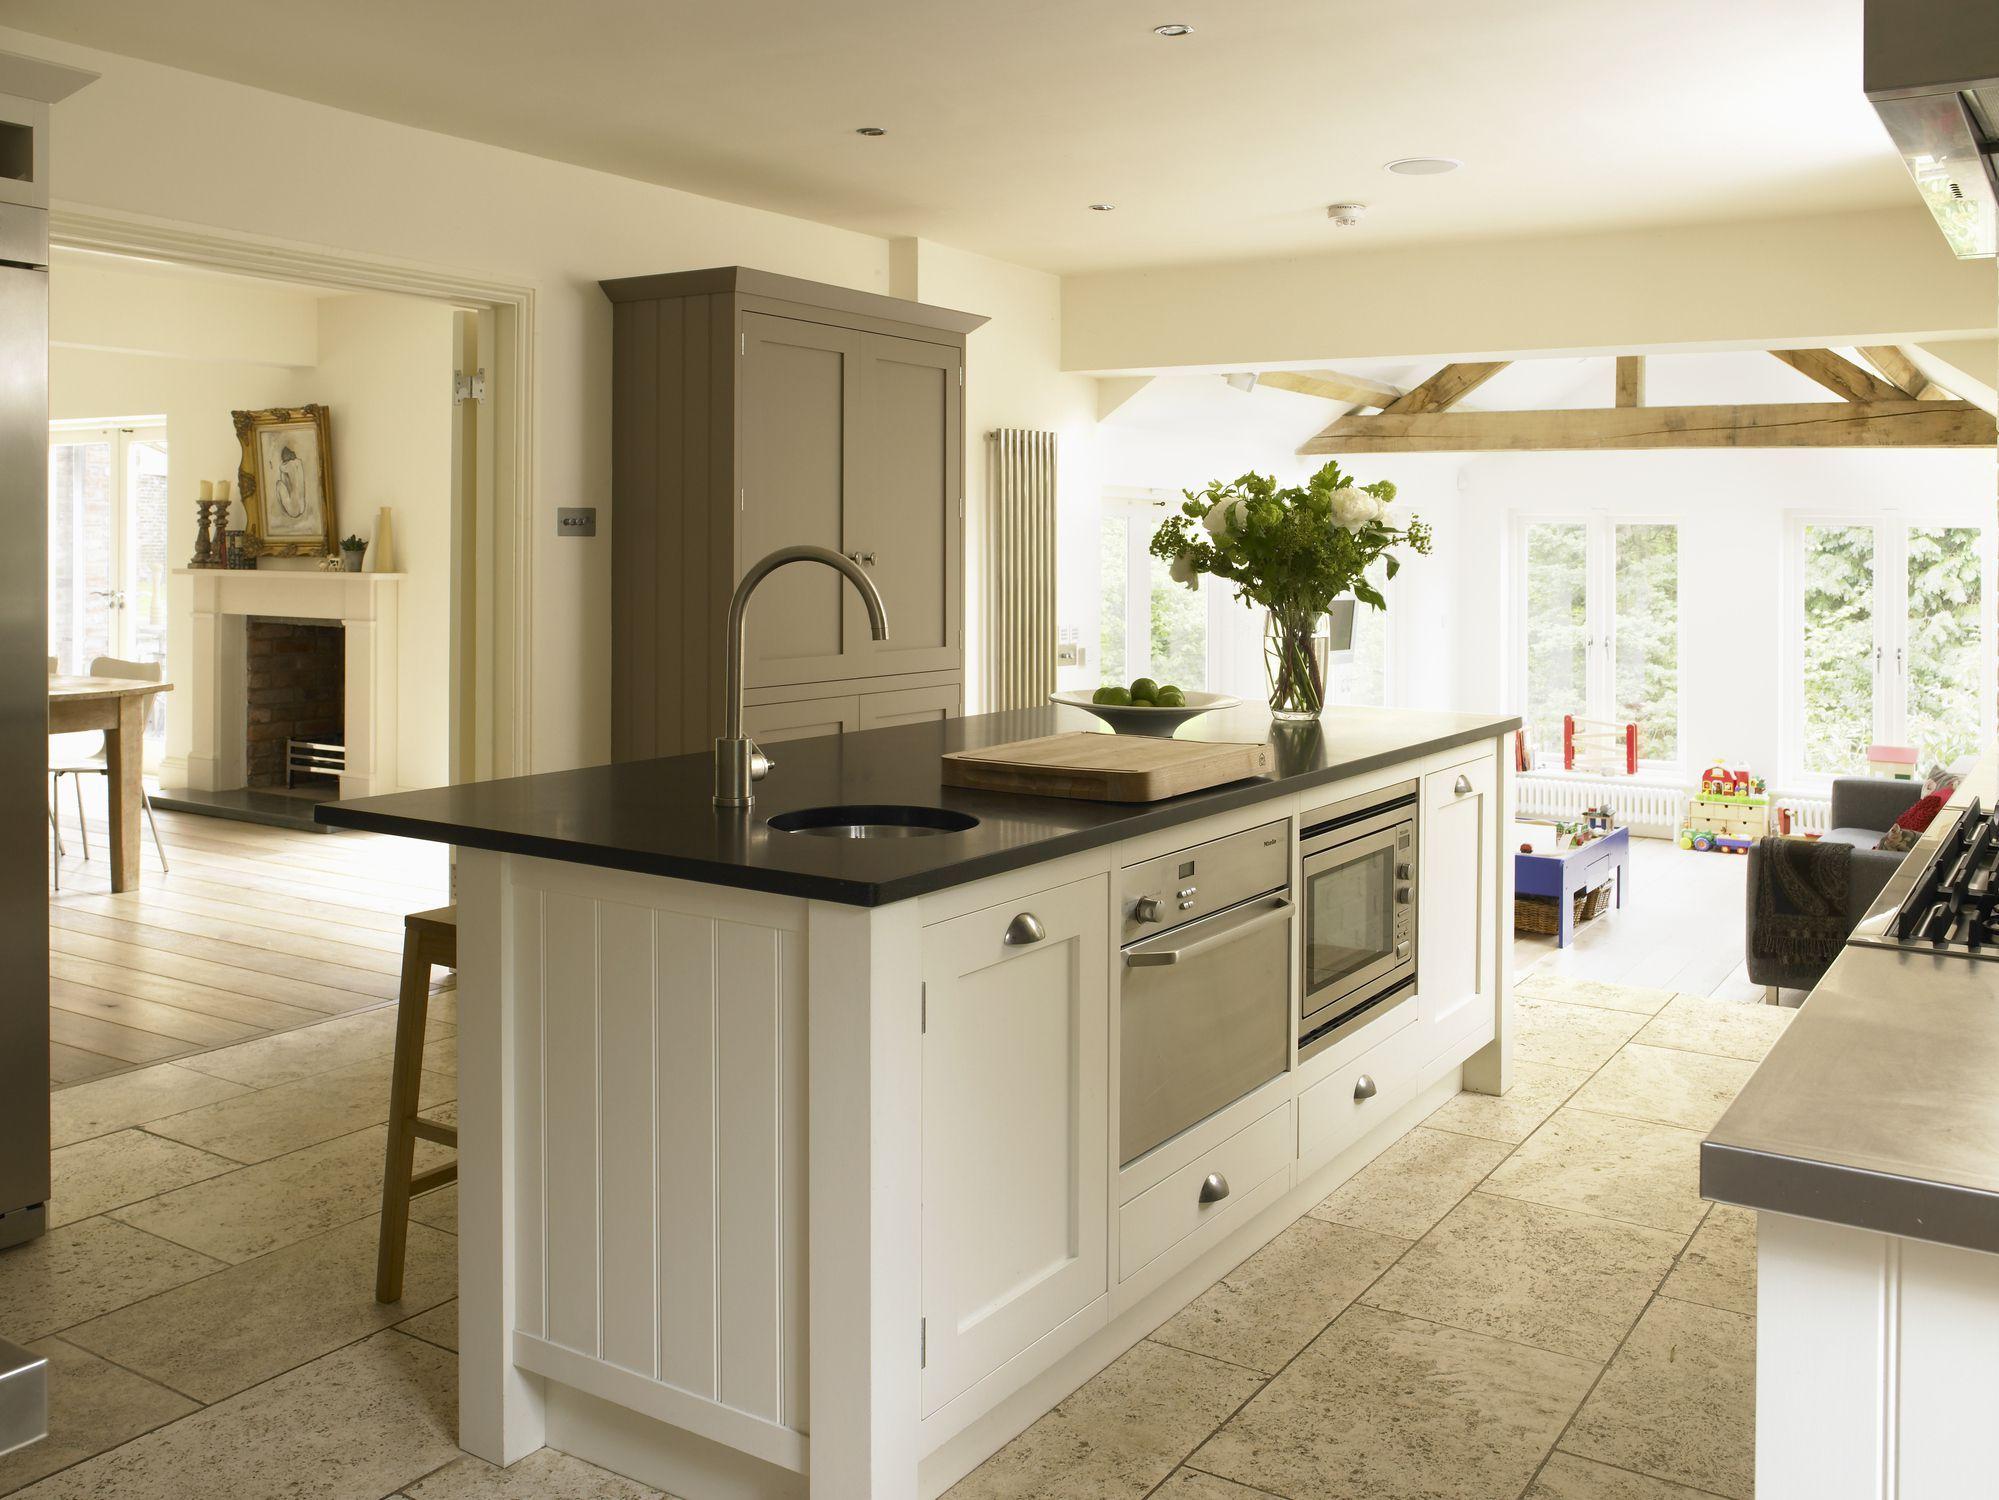 Low Maintenance Kitchen Flooring Ideas Kitchen flooring